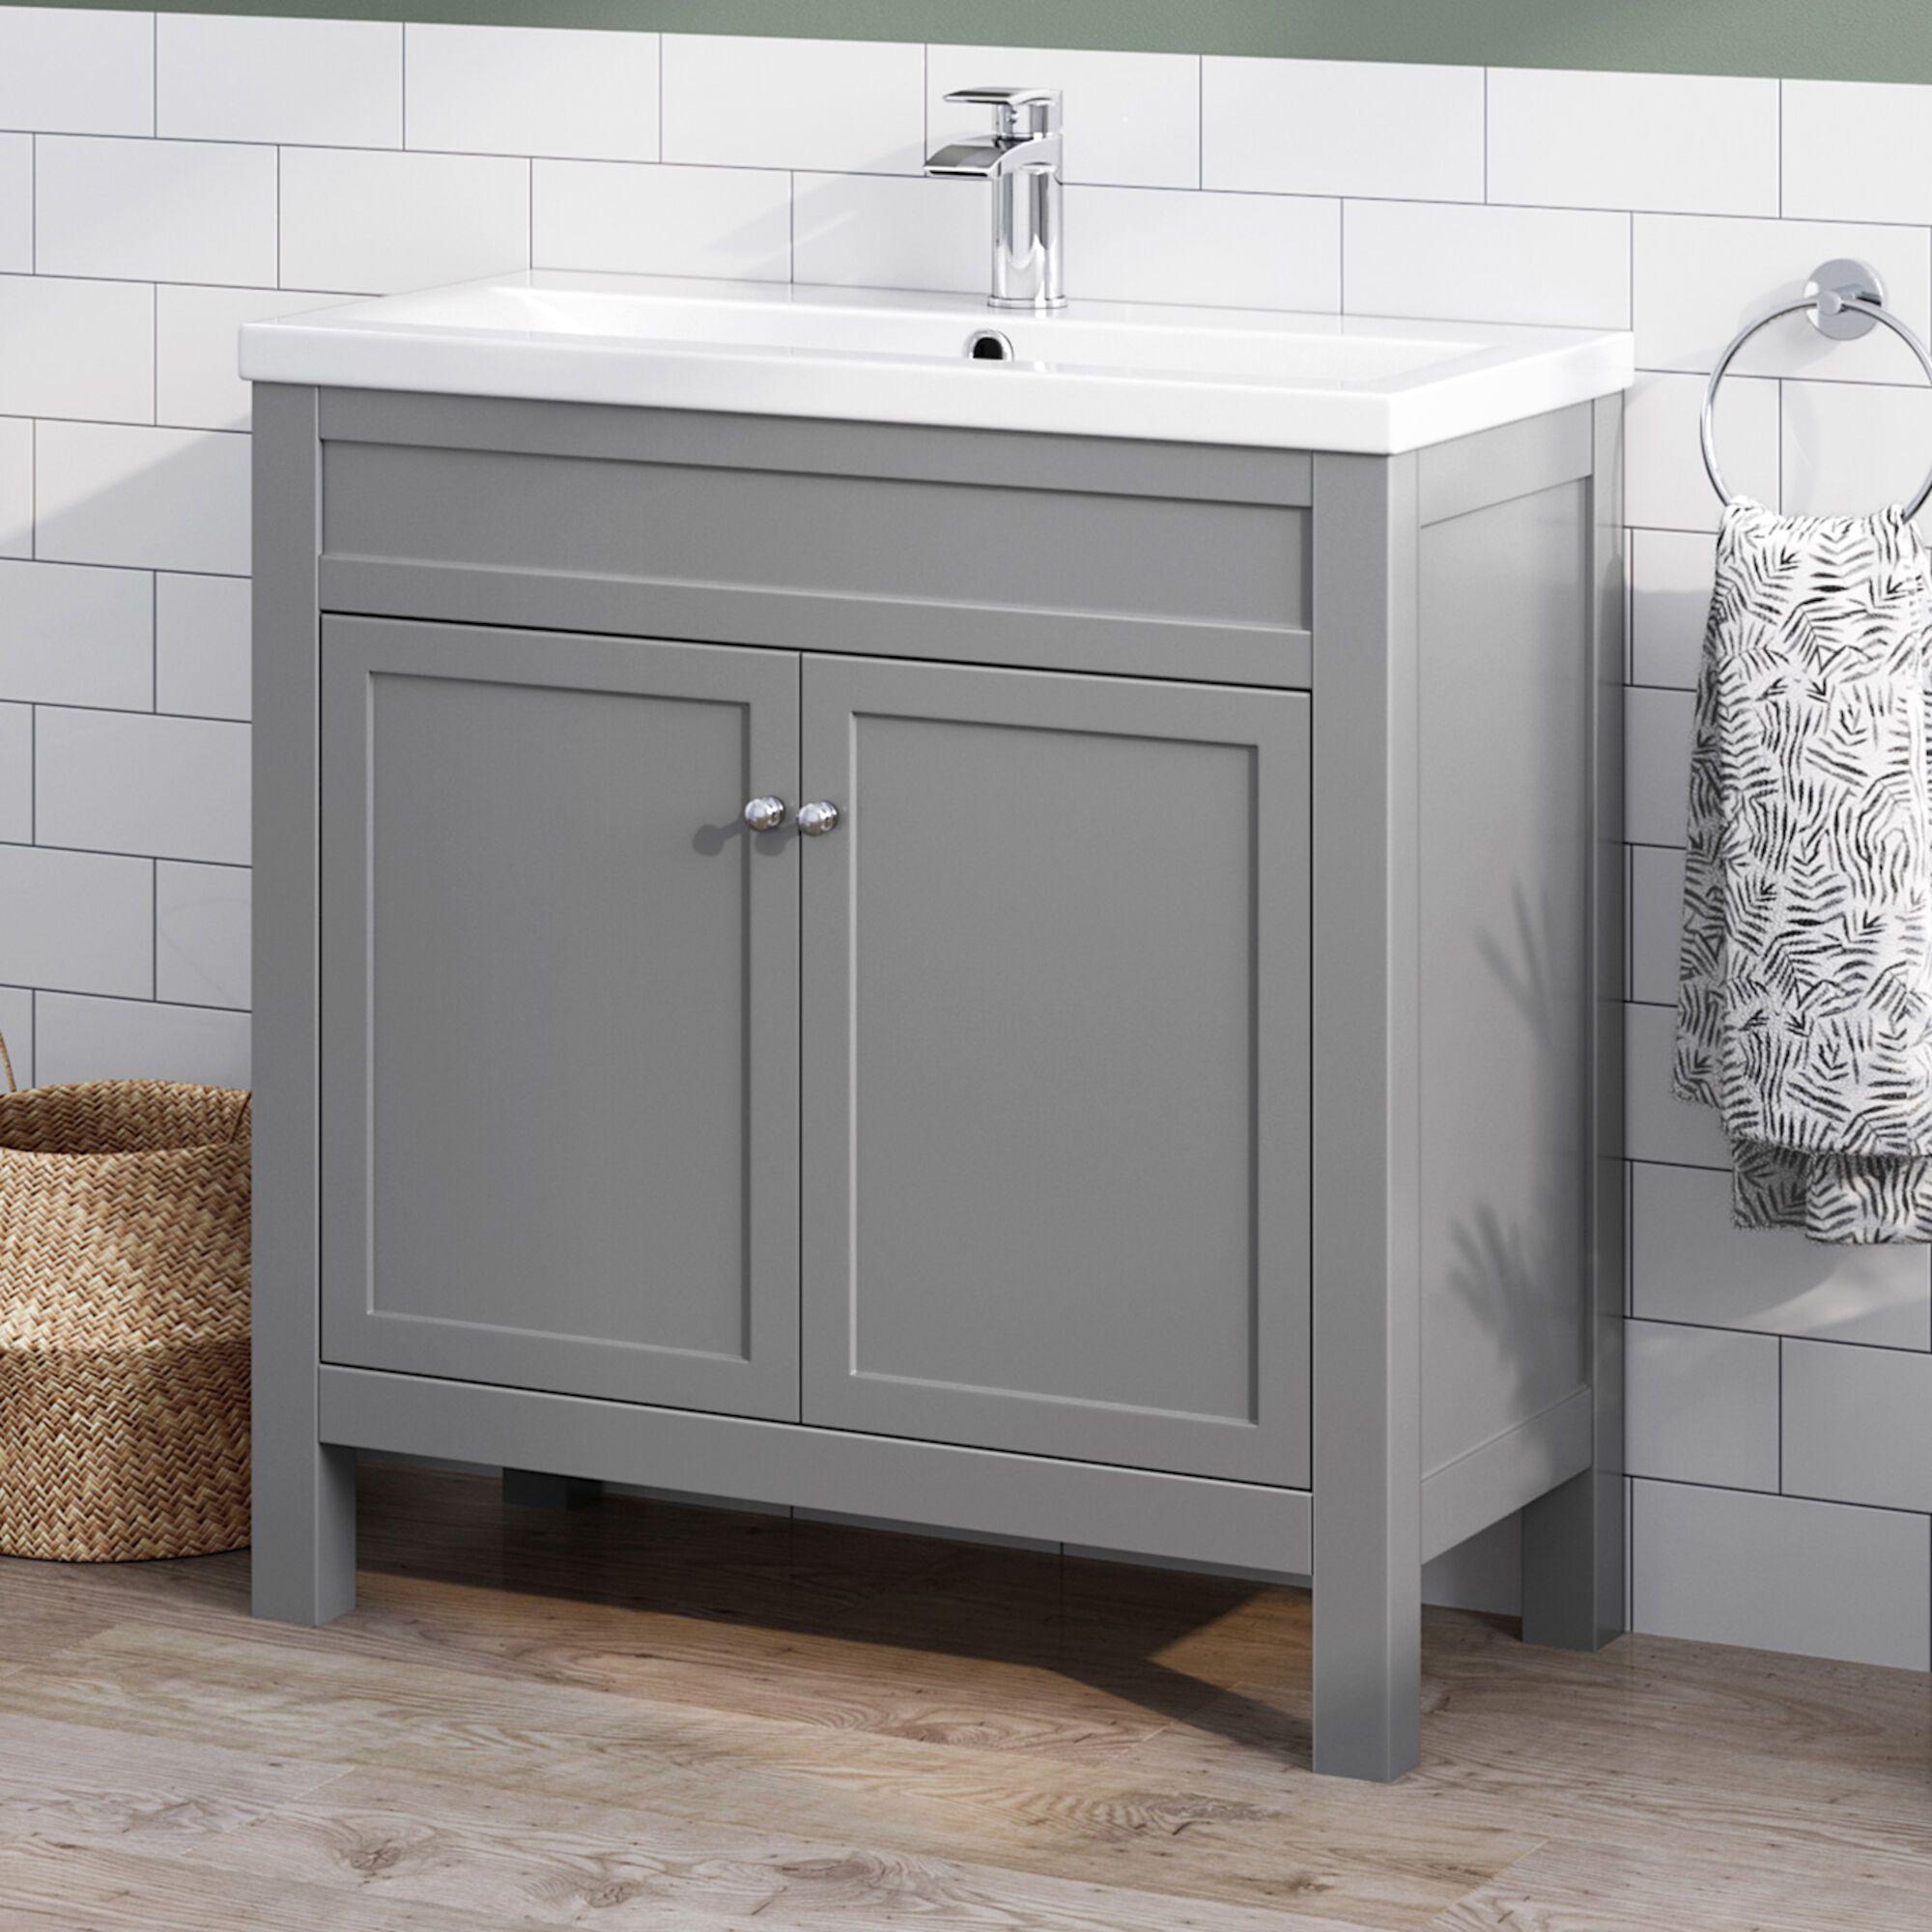 Bathroom Vanity Units Bathroom Cabinets Furniture Units Soak Com Traditional Bathroom Vanity Vanity Units Sink Vanity Unit